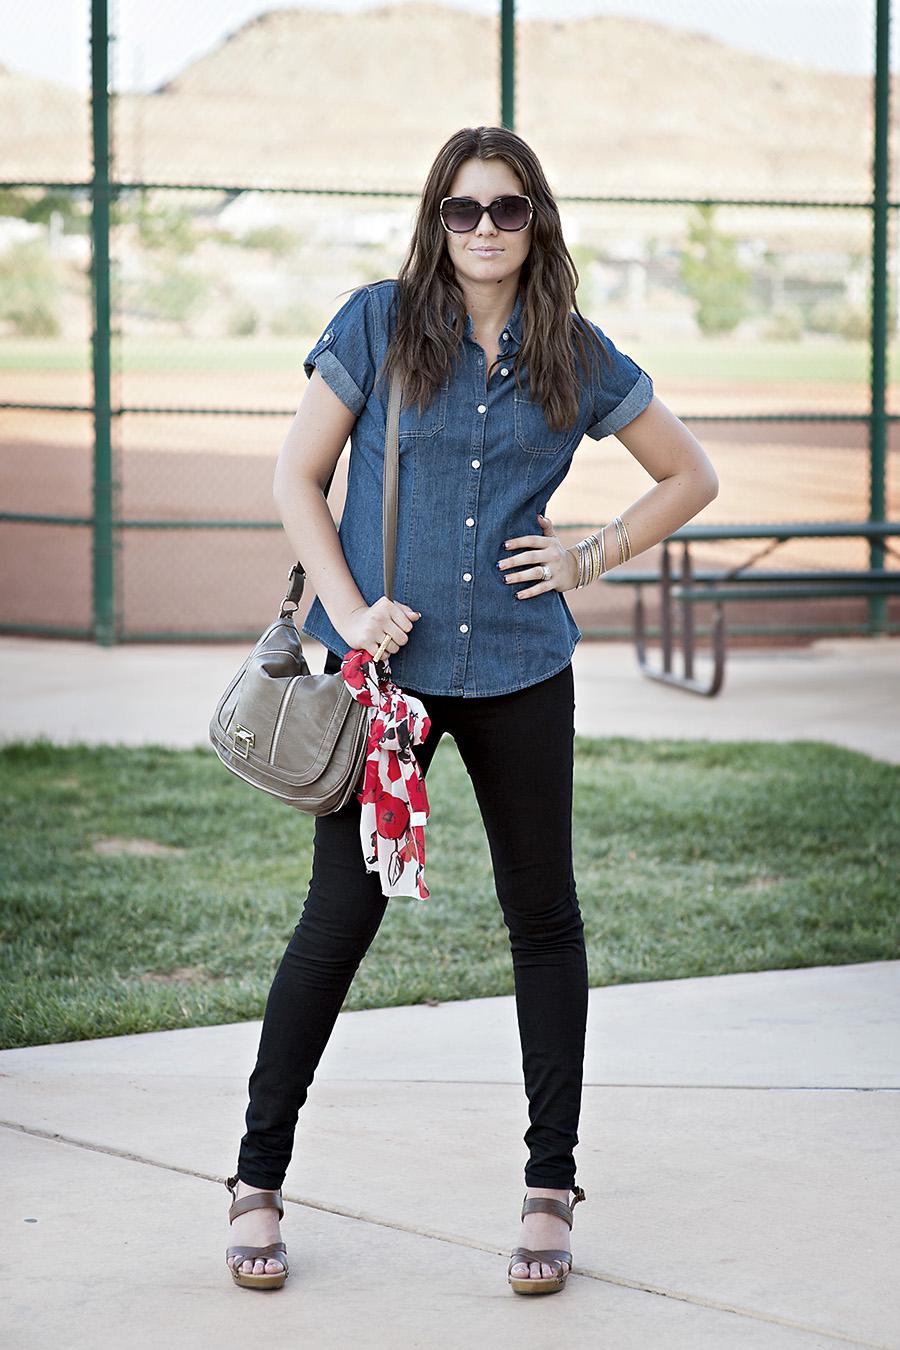 Utah Fashion Blogger, Modest Fashion Blogger, Back Jeans, Sunglasses